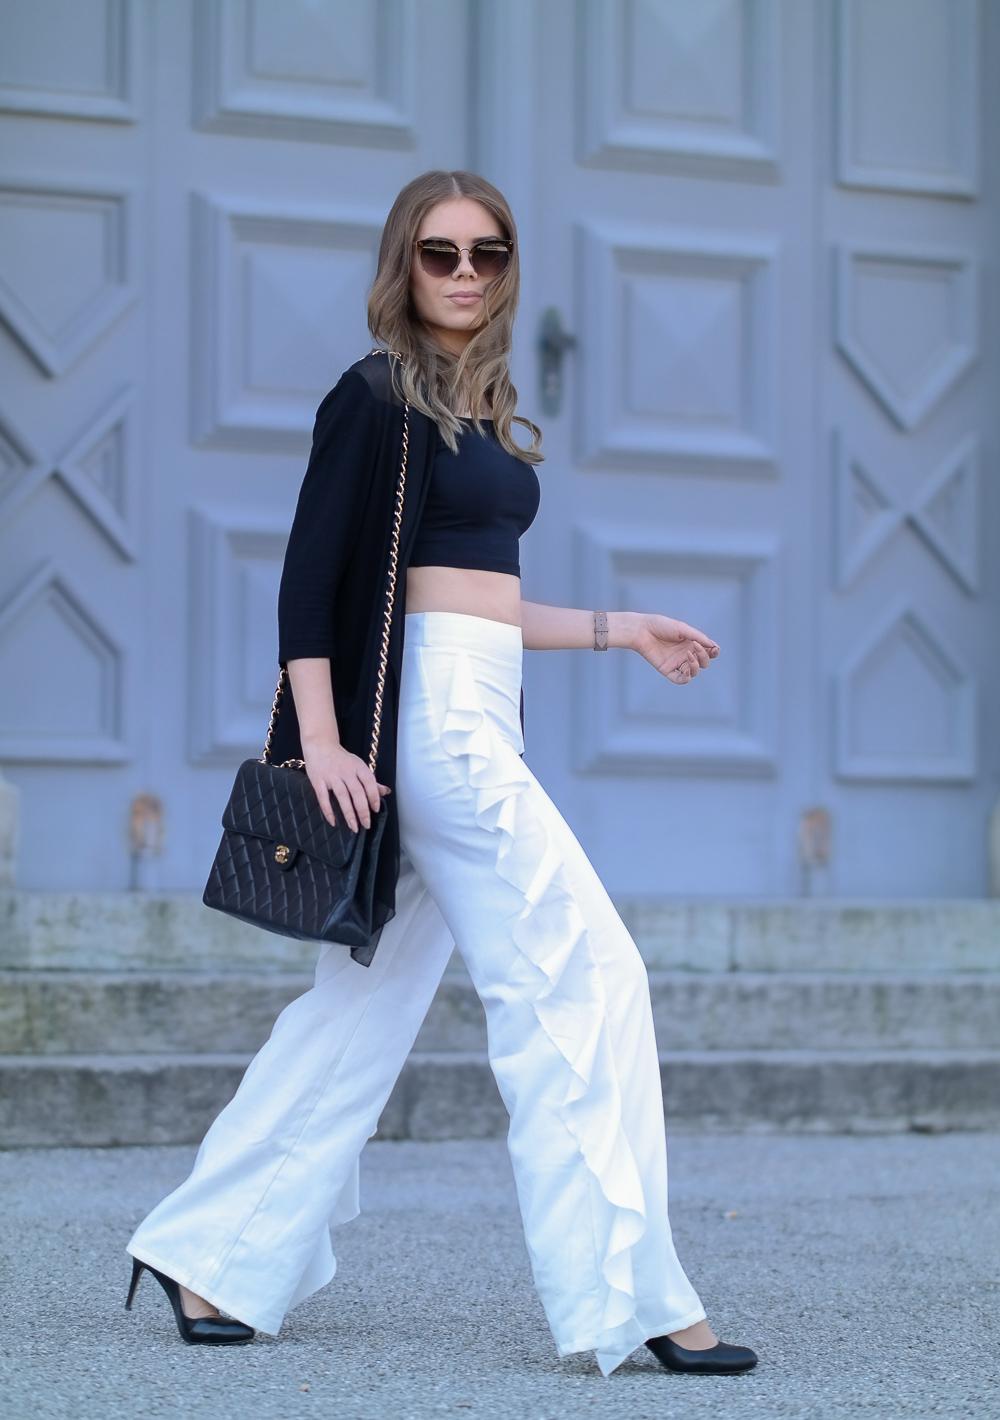 High Fashion Look-Volant Hose-Chanel Bag-Crop Top